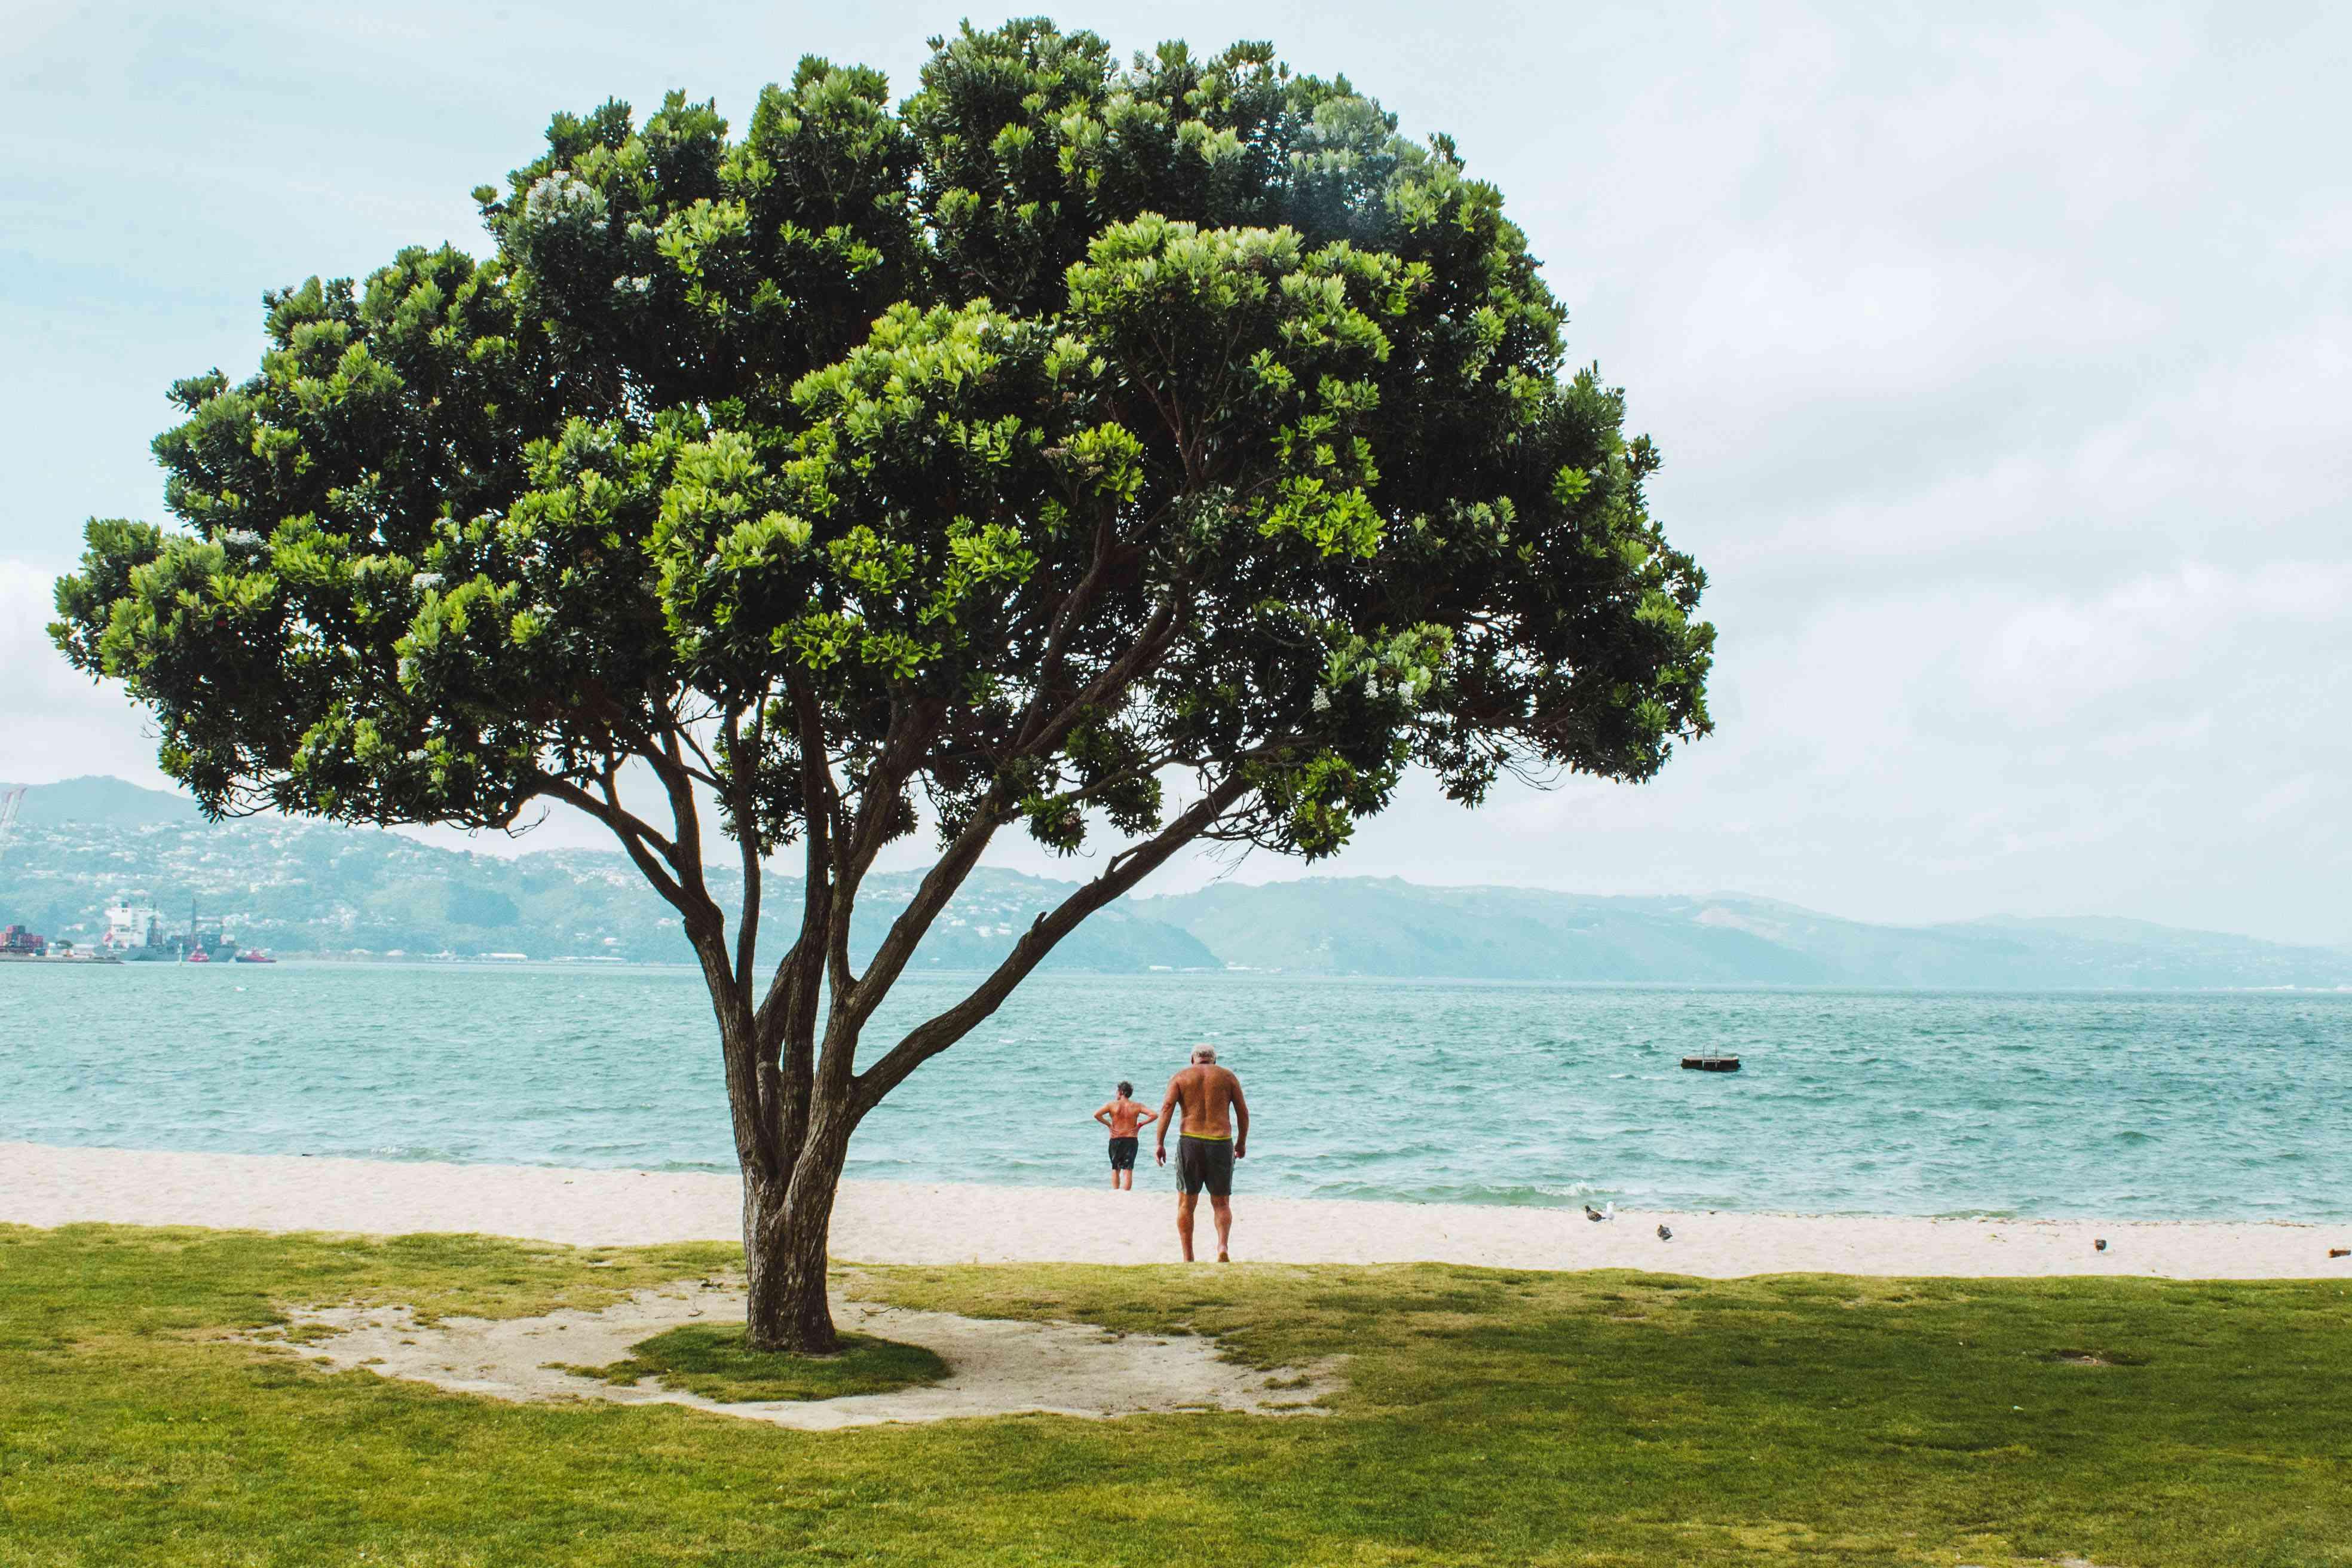 Gente tumbada en la playa en Oriental Bay